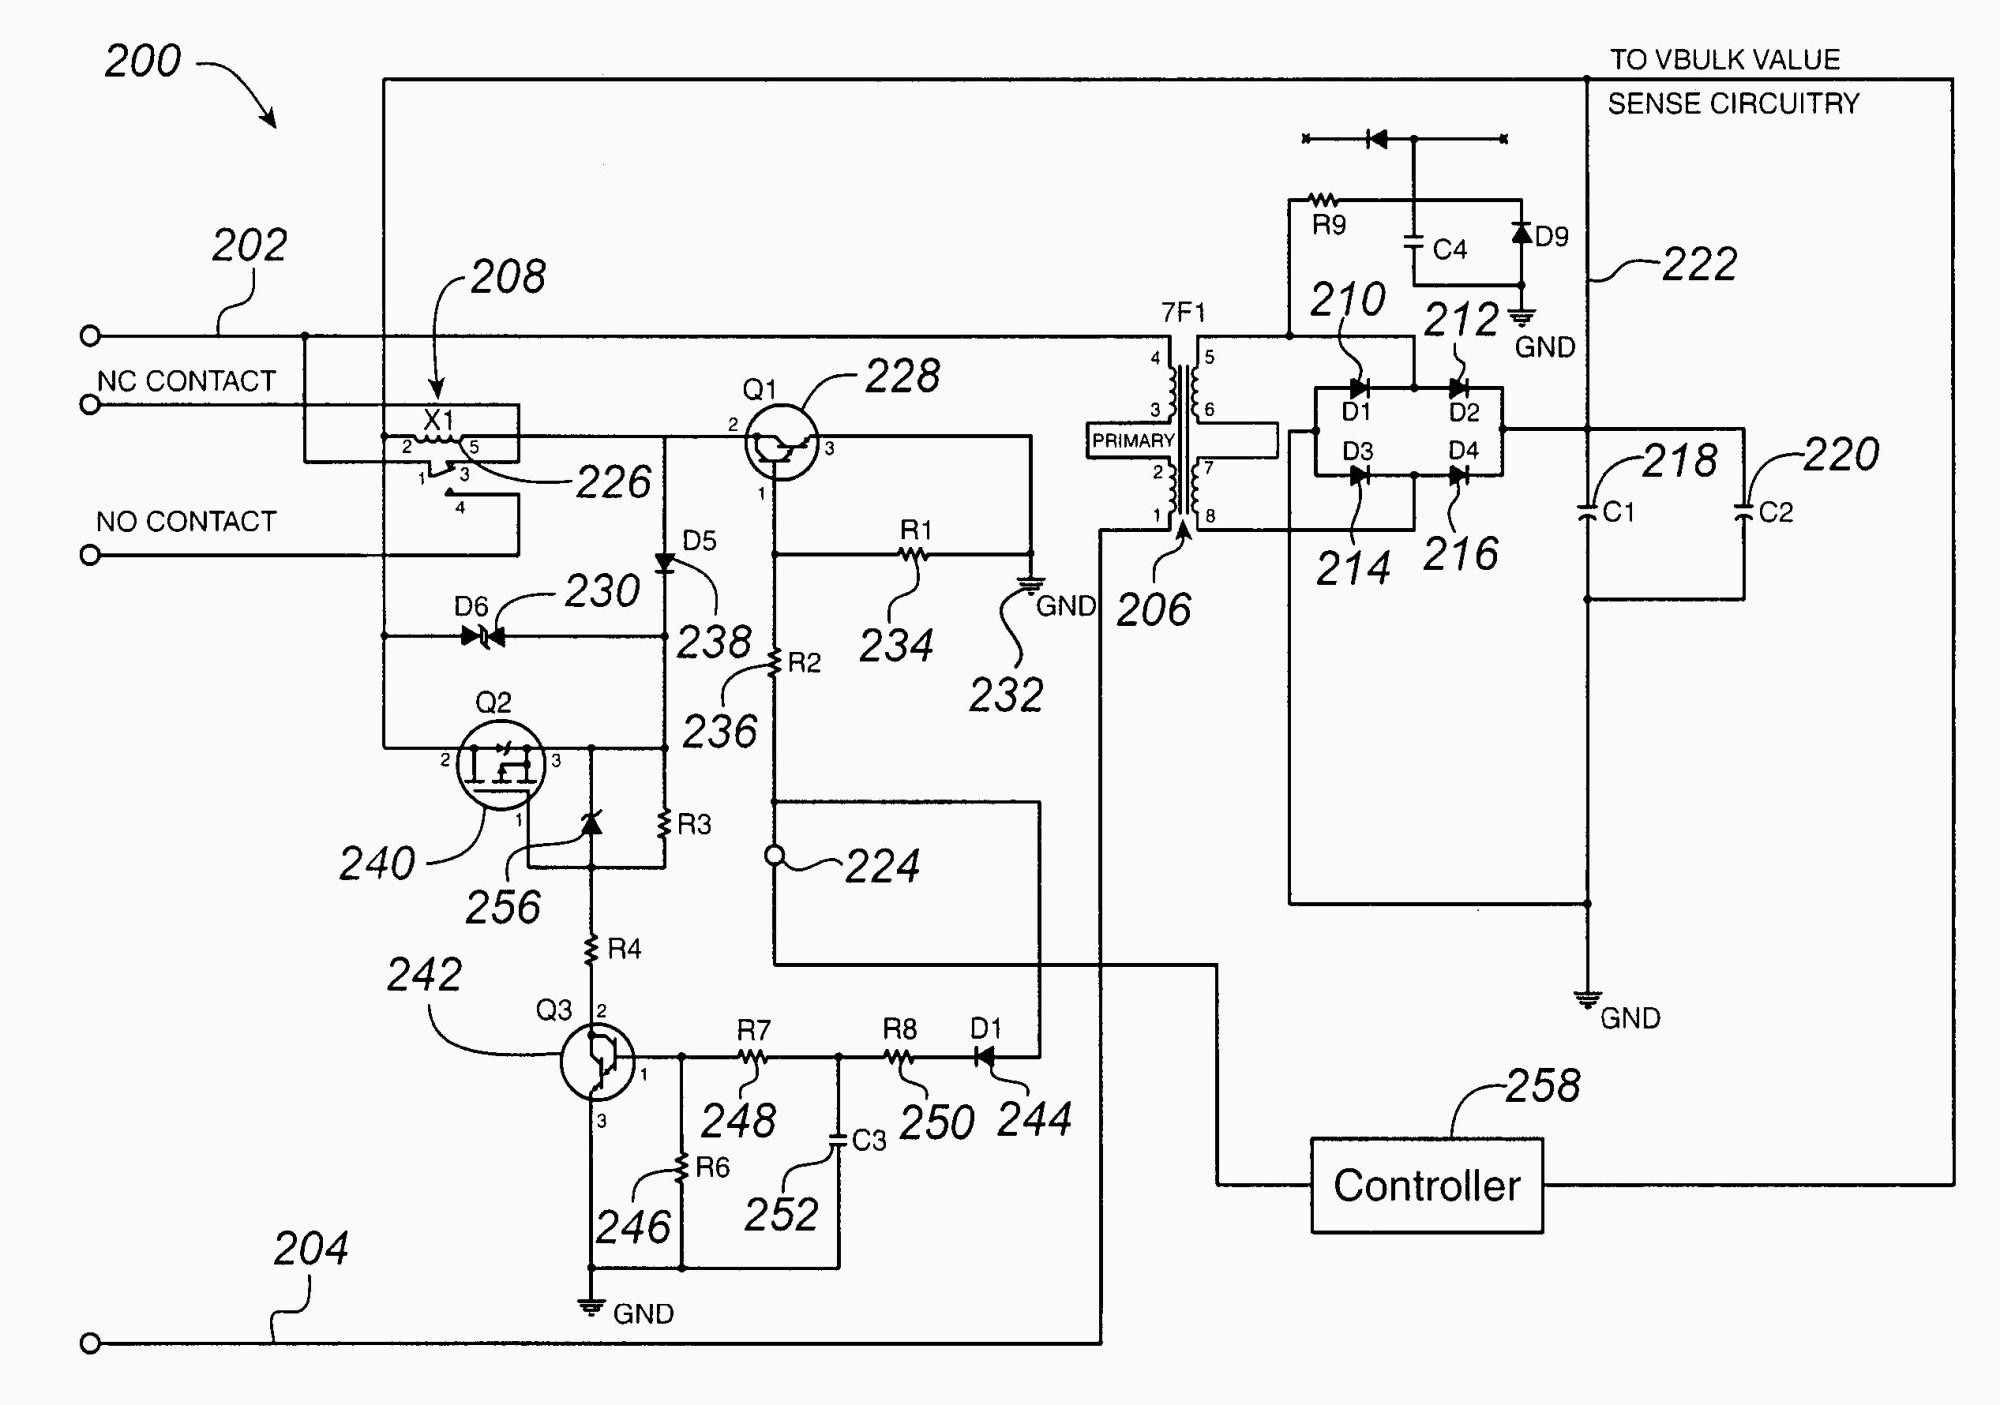 hight resolution of true tac 48 wiring diagram printable wiring diagram true tac 48 wiring diagram